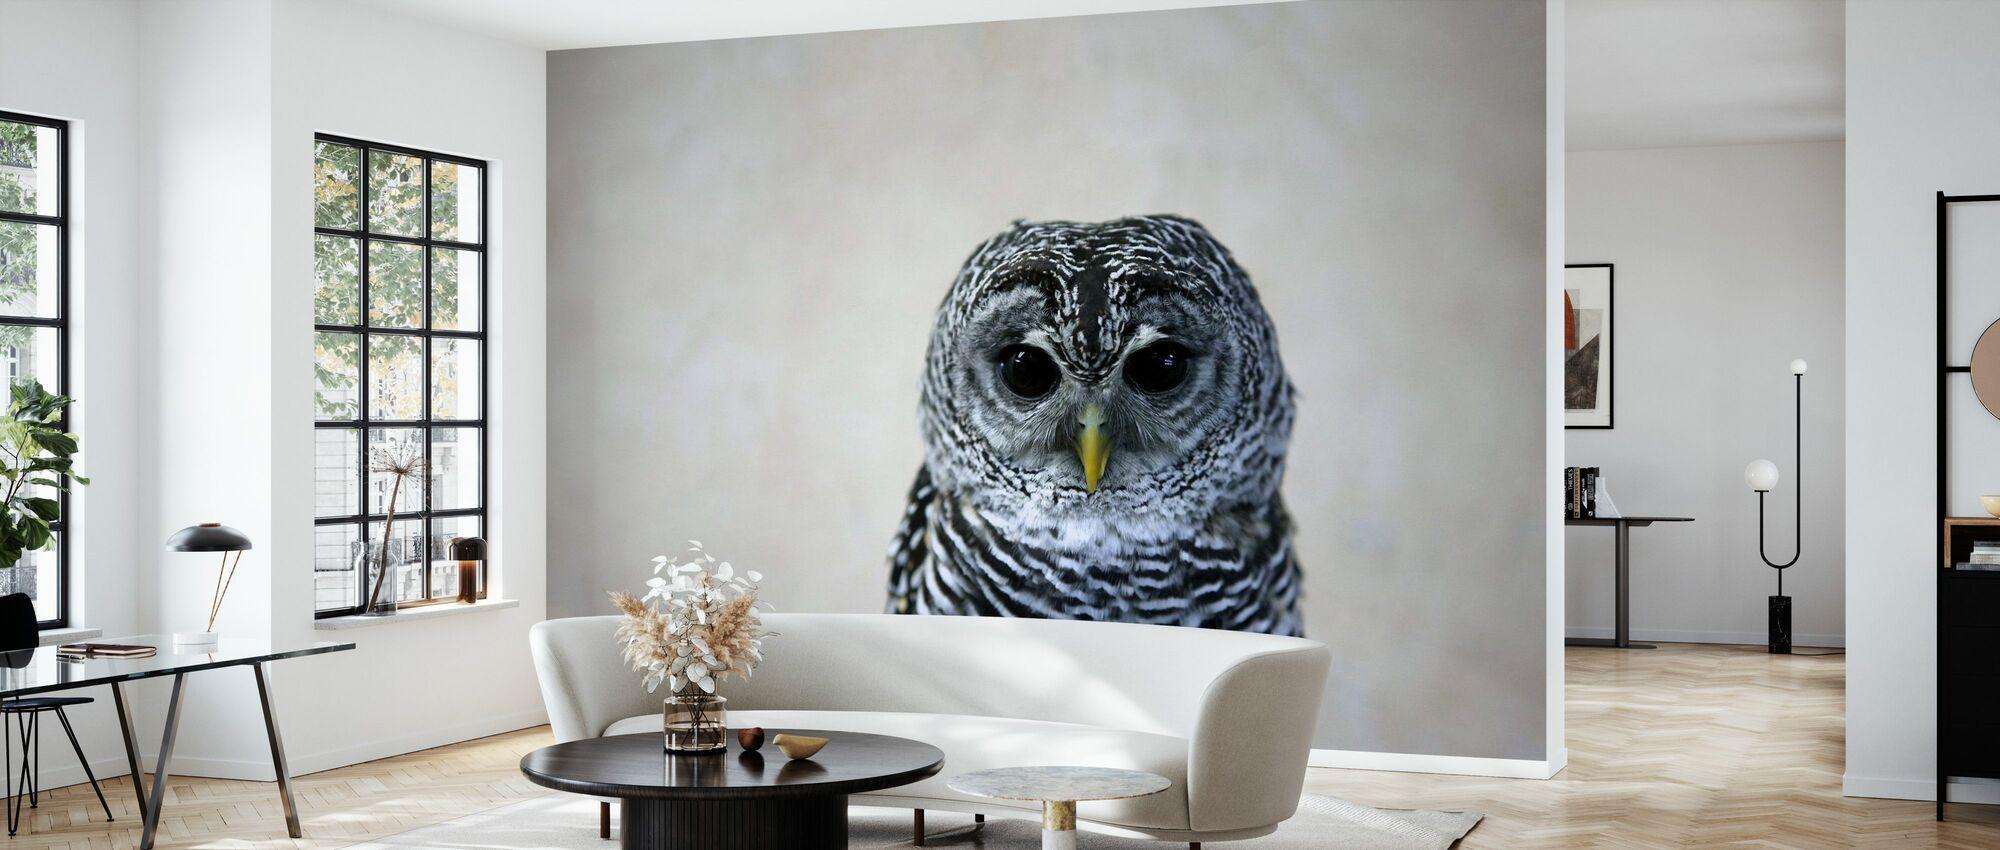 Portrait of an Owl - Wallpaper - Living Room